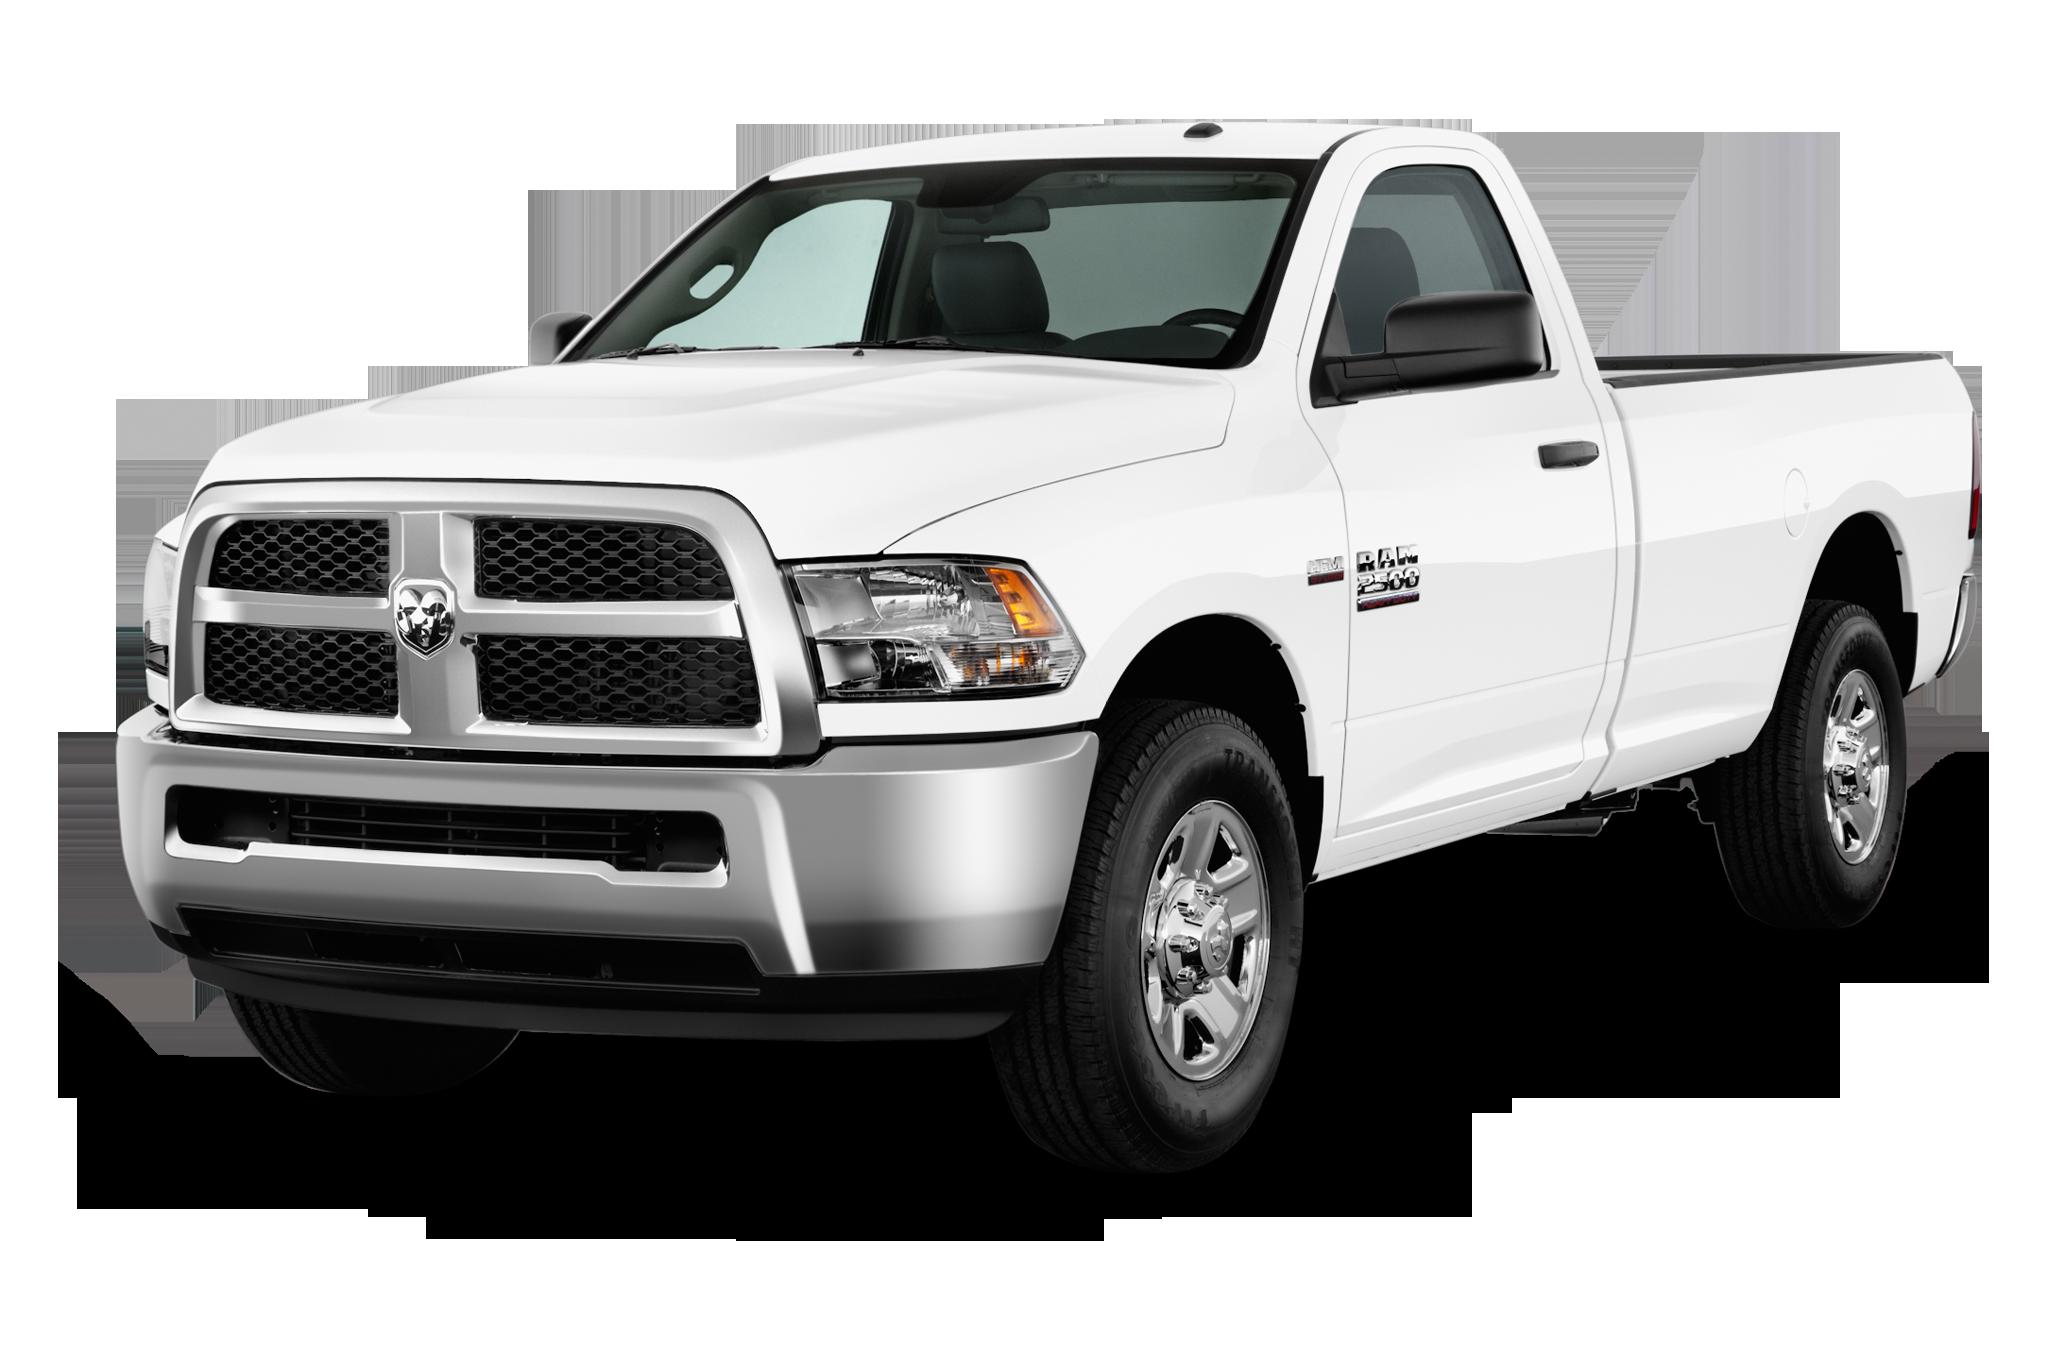 2015 Aev Prospector Ram 2500 Power Wagon Review Dodge Dakota Fuel Filter 2 73